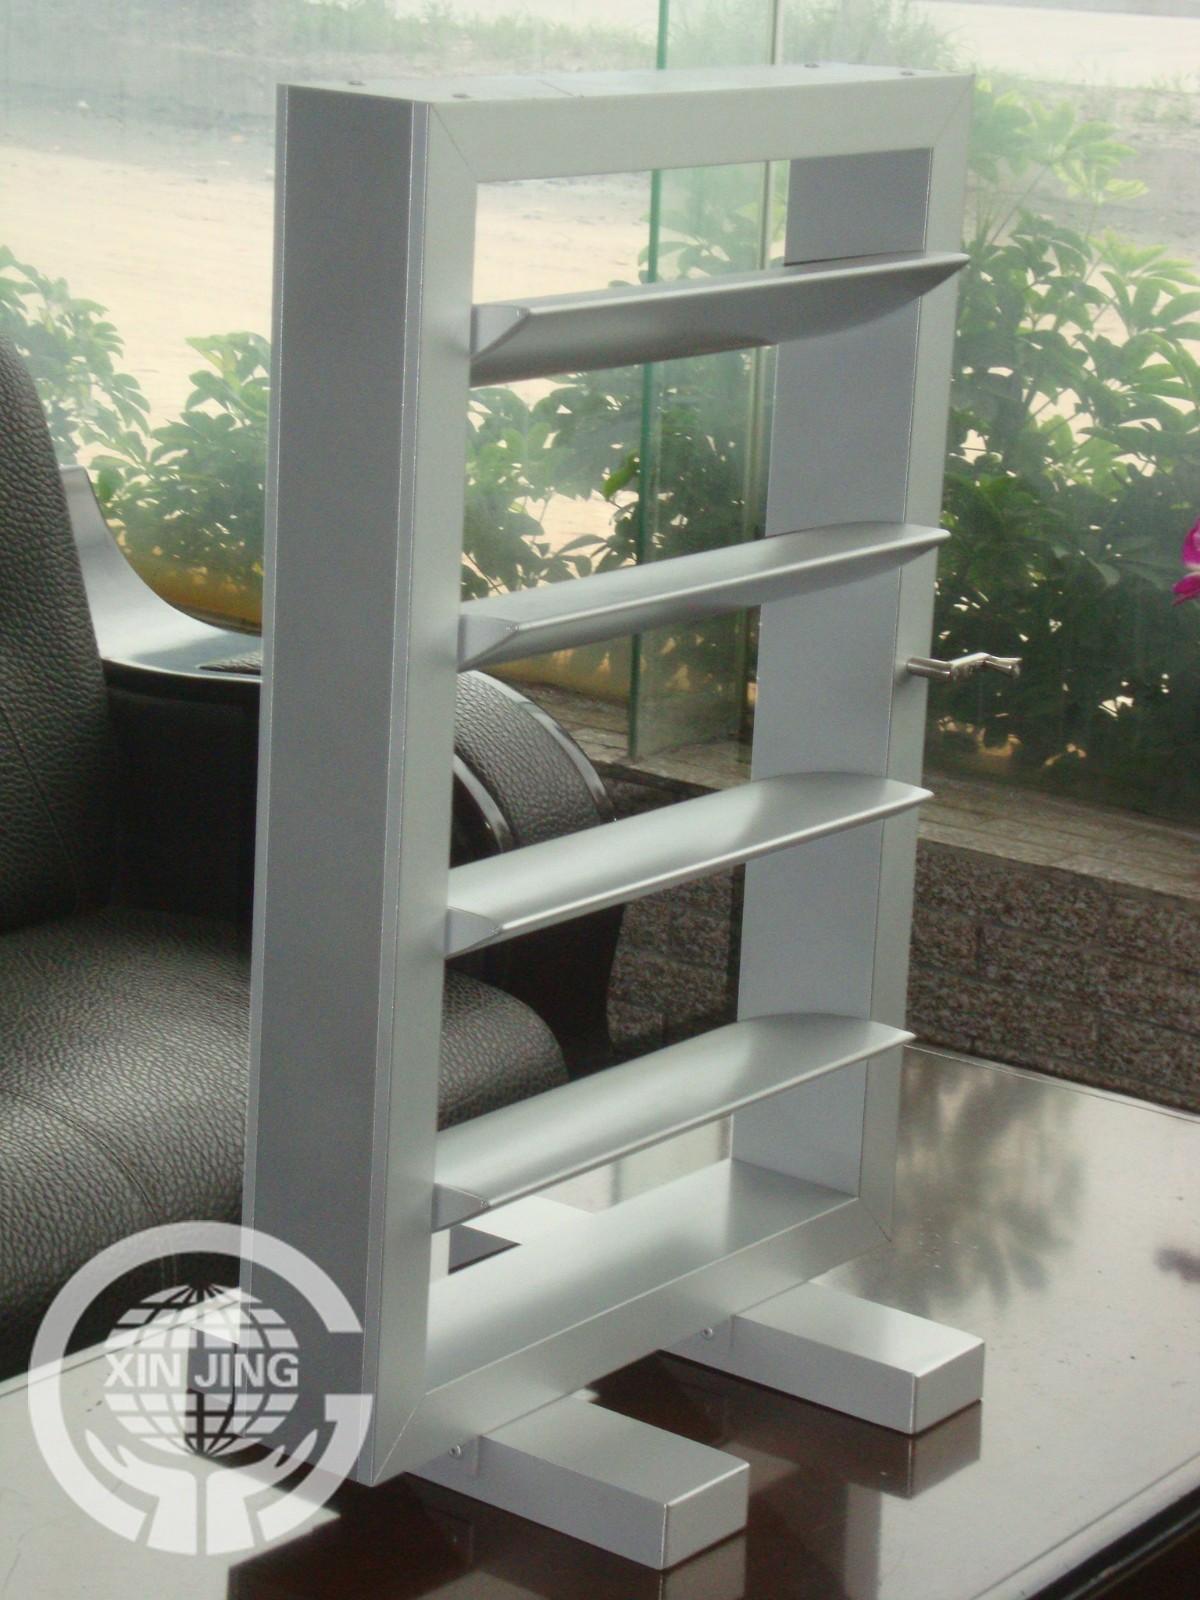 building sunshade design